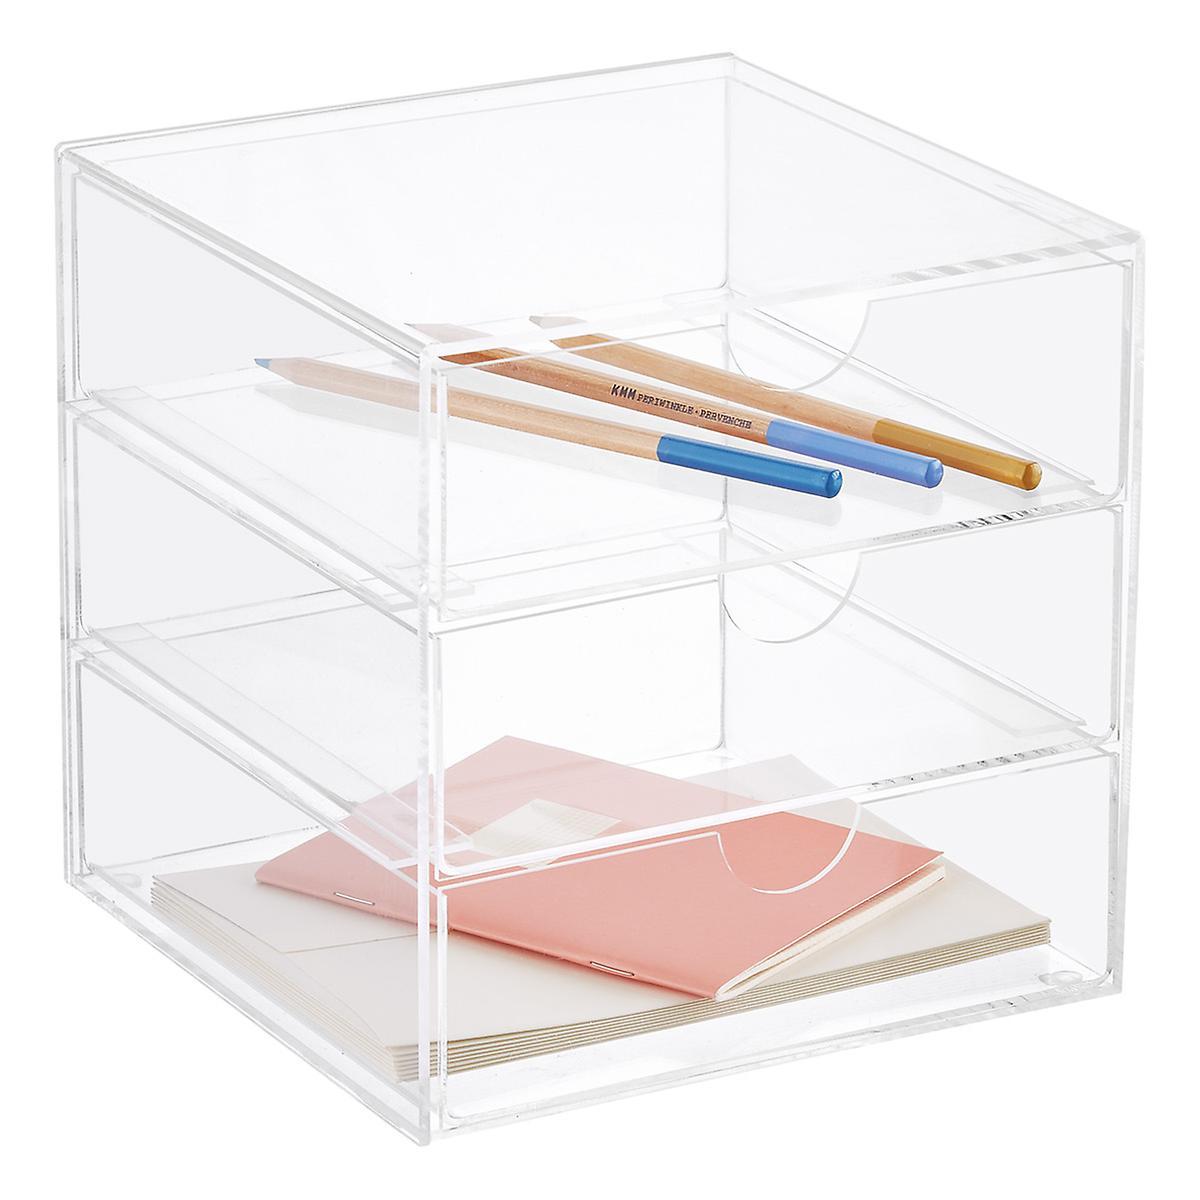 Premium Acrylic Office Supplies Organizer Case With Drawer